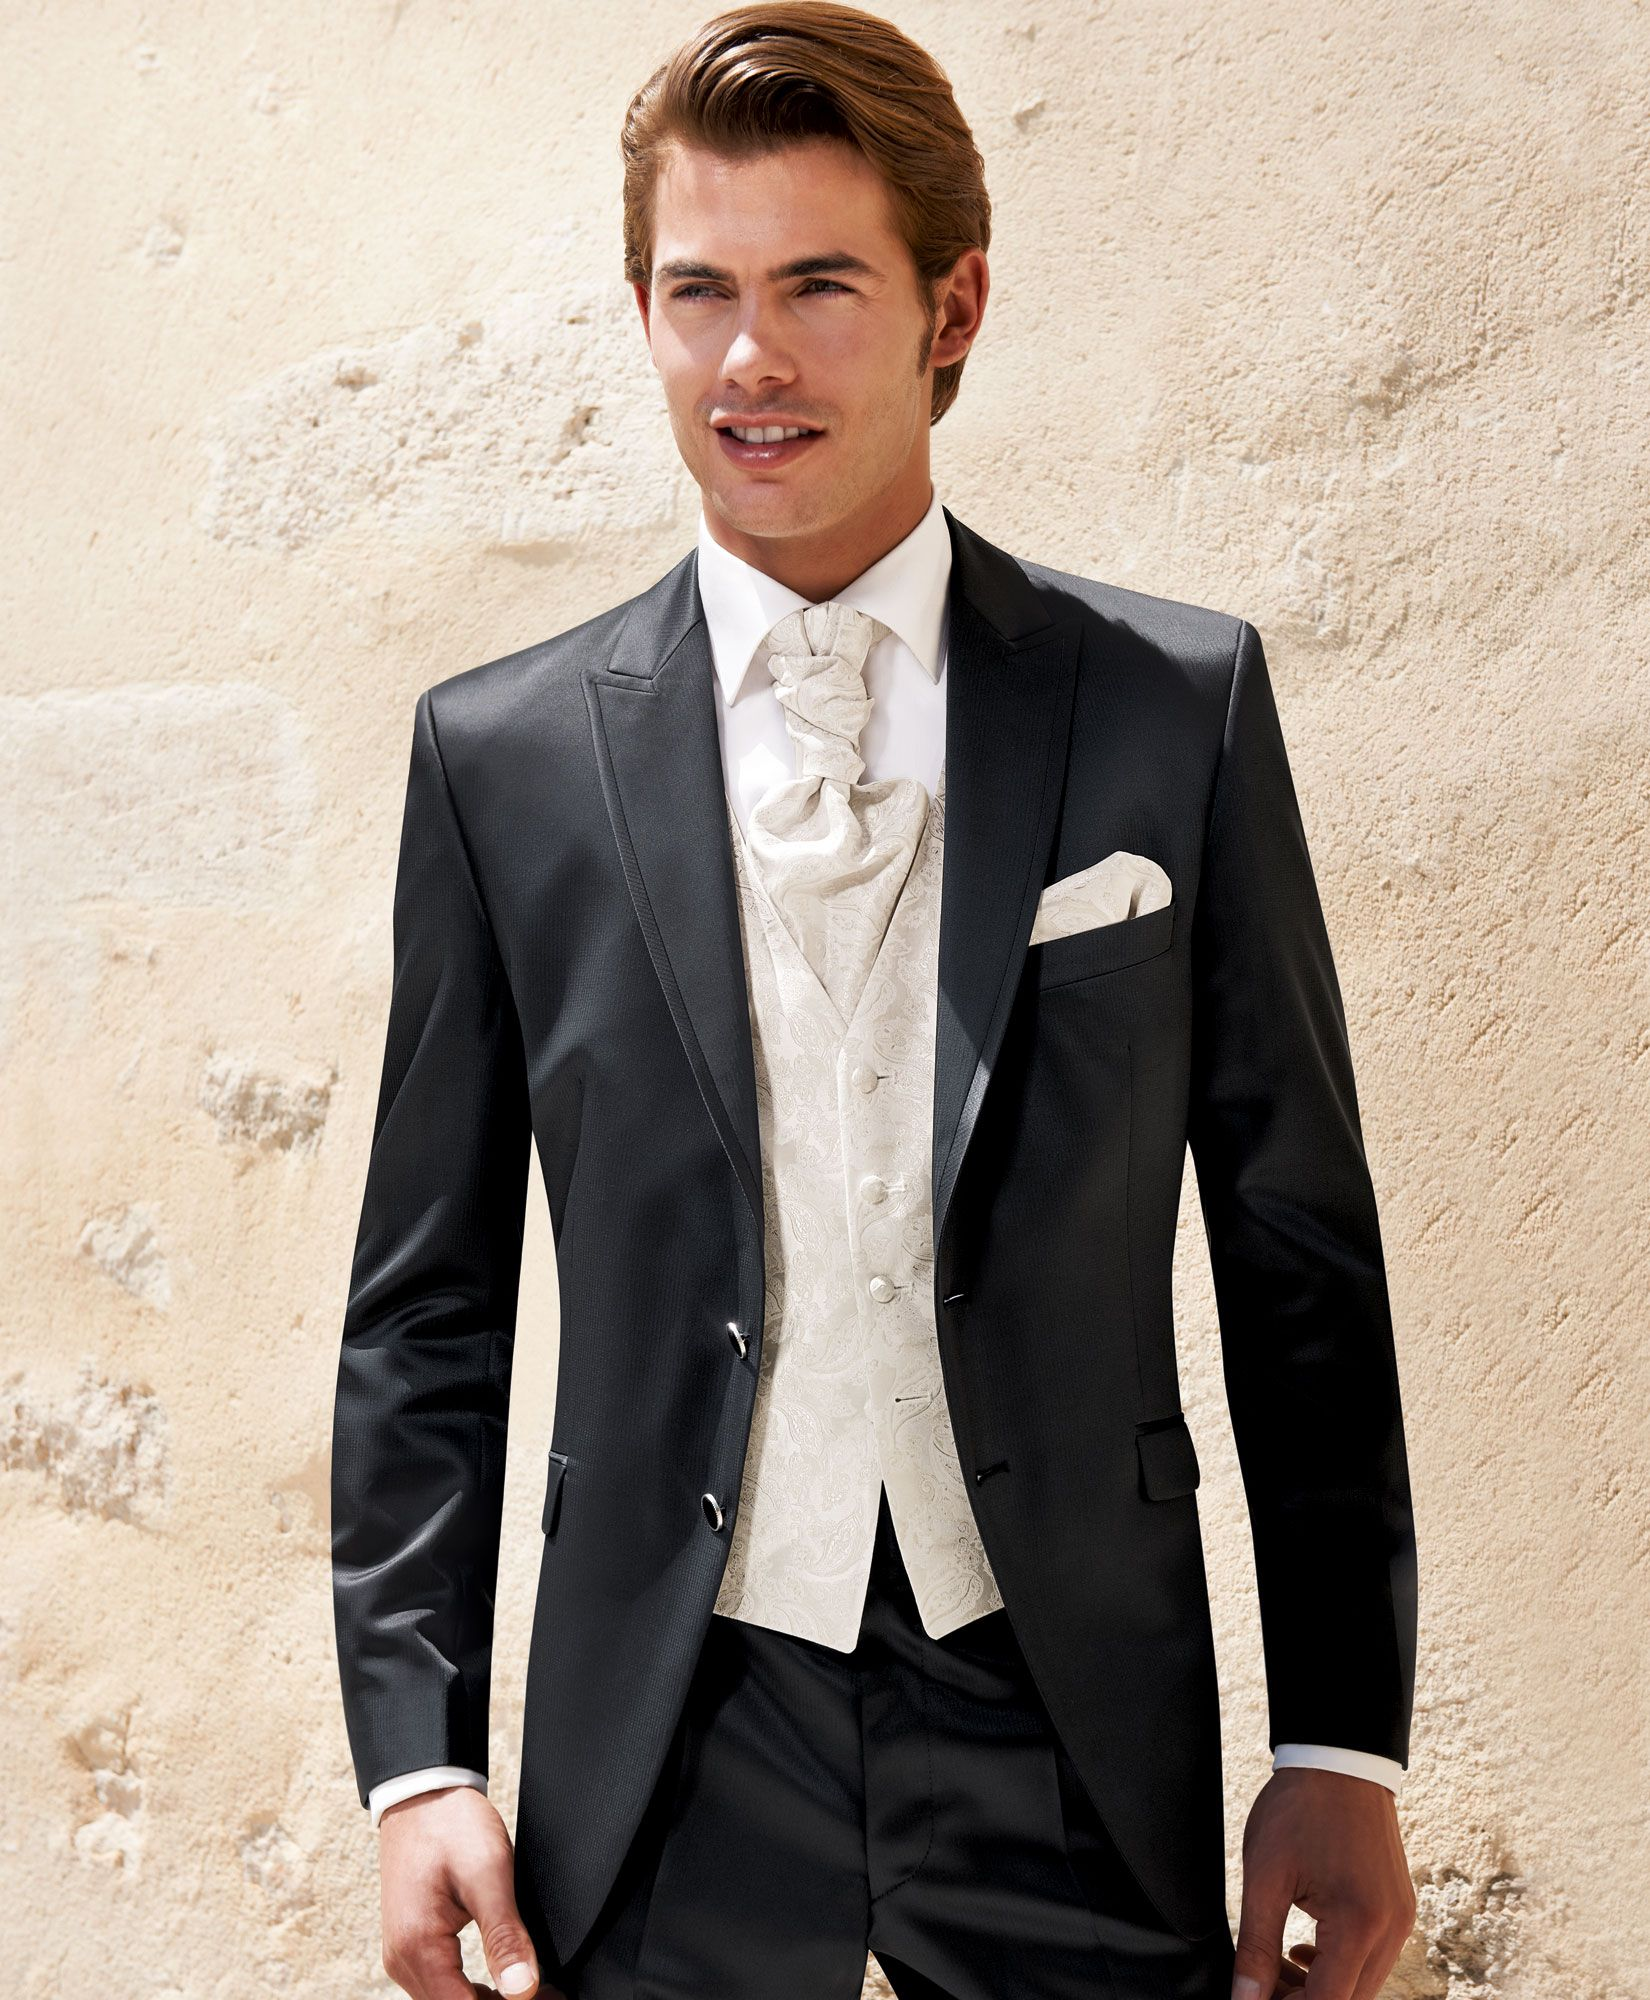 Wedding in provence model 8 hochzeit anzug wedding suits pinterest wedding wedding - Hochzeitsanzug hugo boss ...